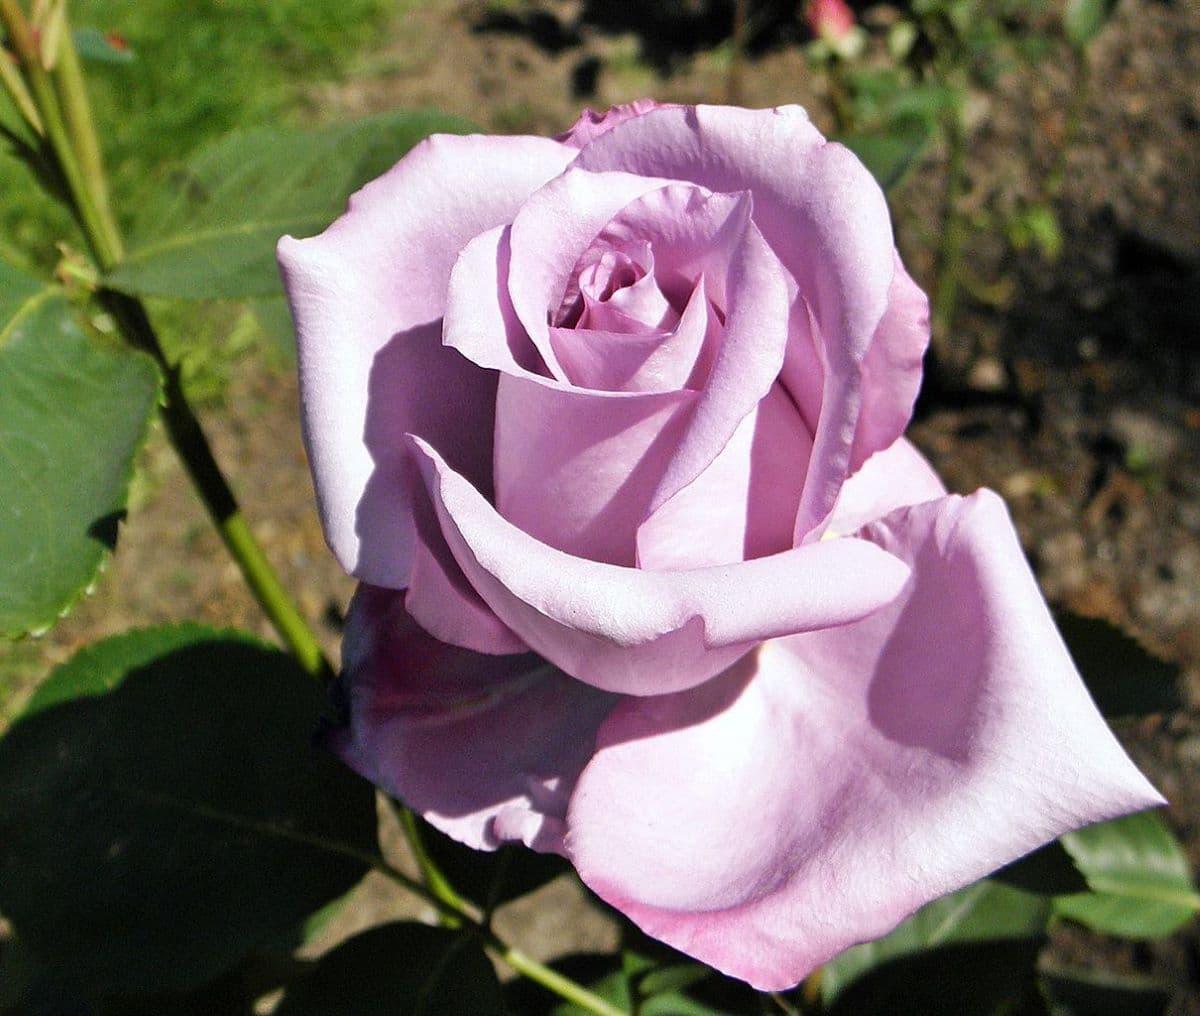 La rosa híbrido de té es un arbusto de flores grandes